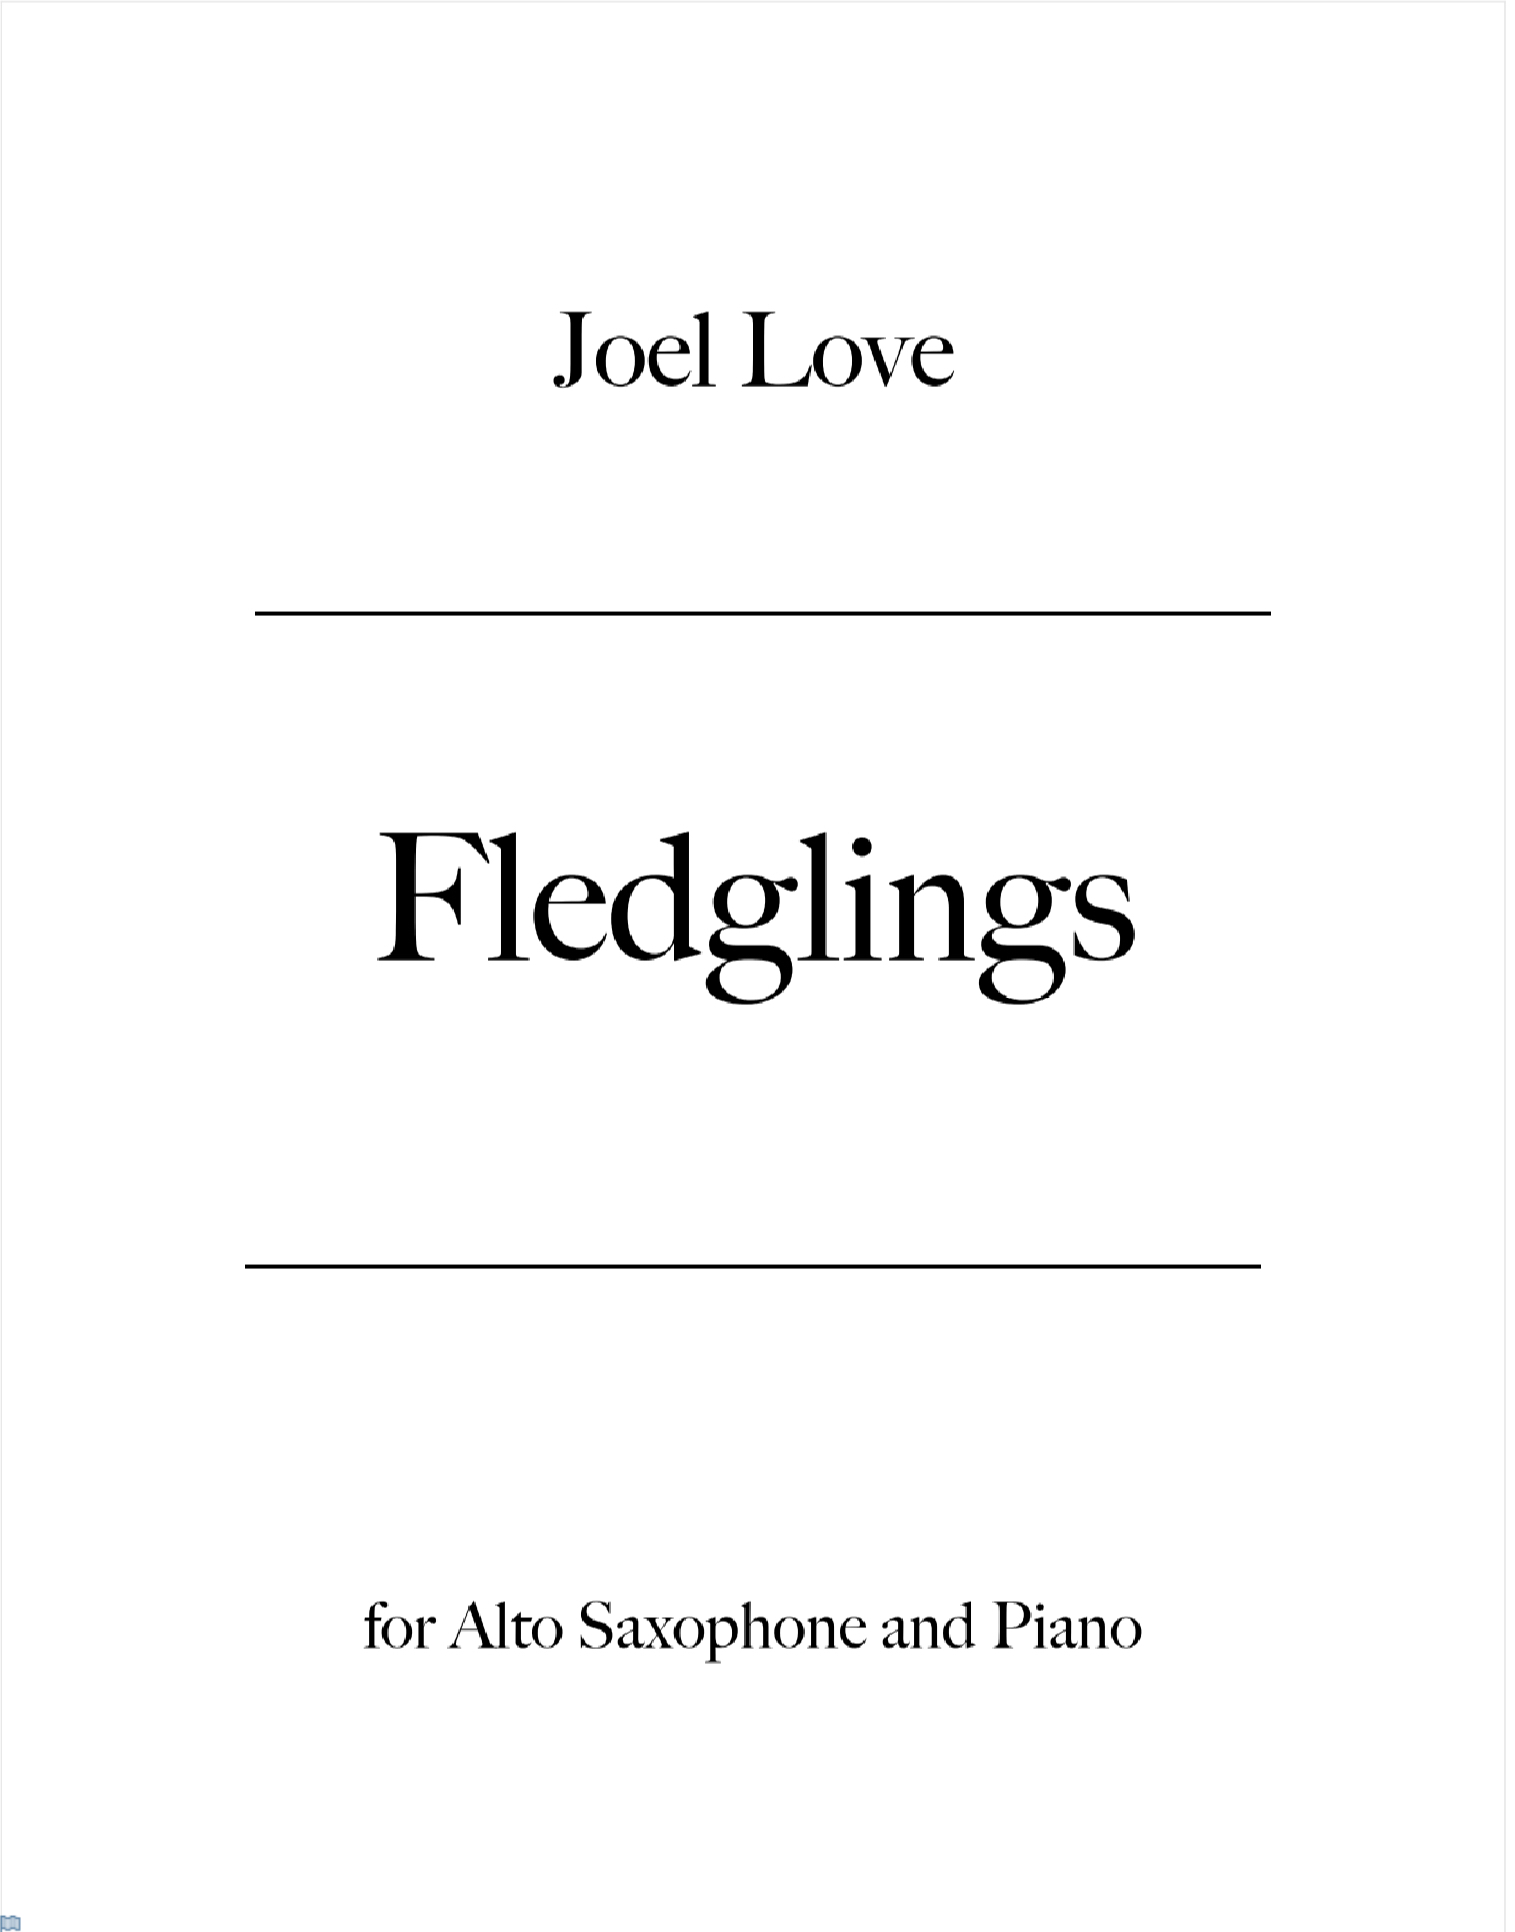 Fledglings by Joel Love